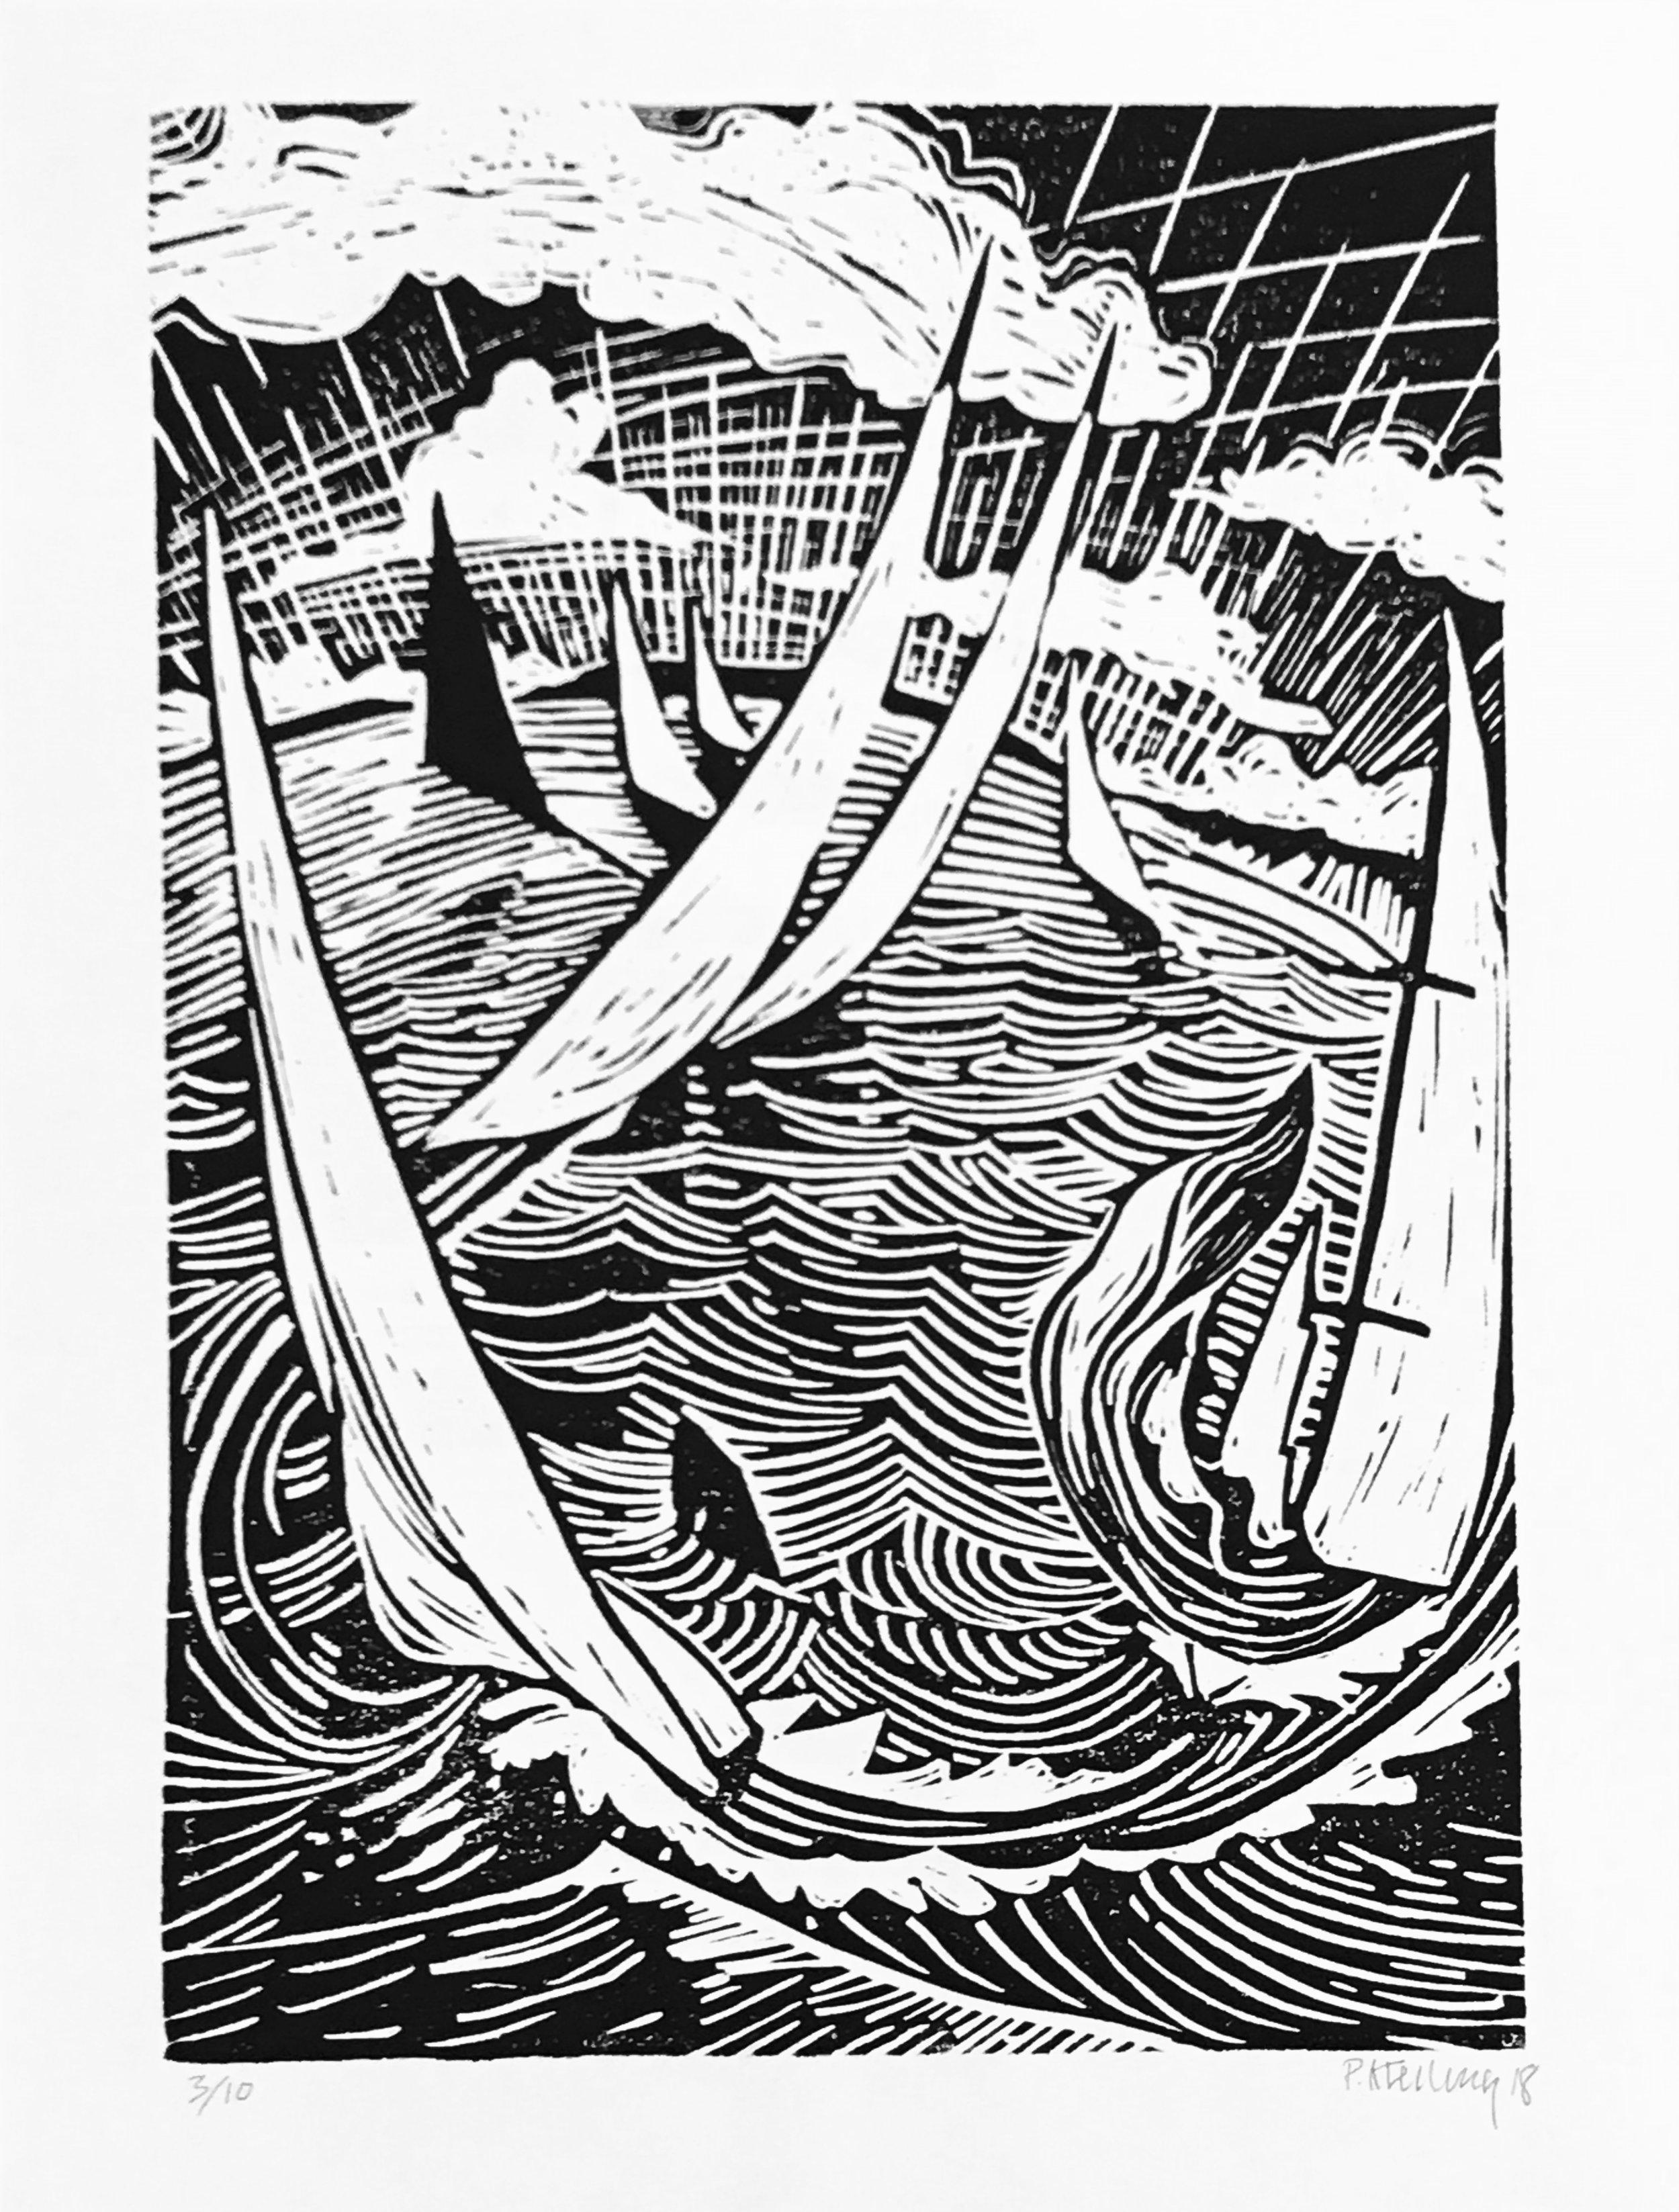 - Paul KreilingDown & Around2018Linoleum block printedition of 1018 x 12 inches